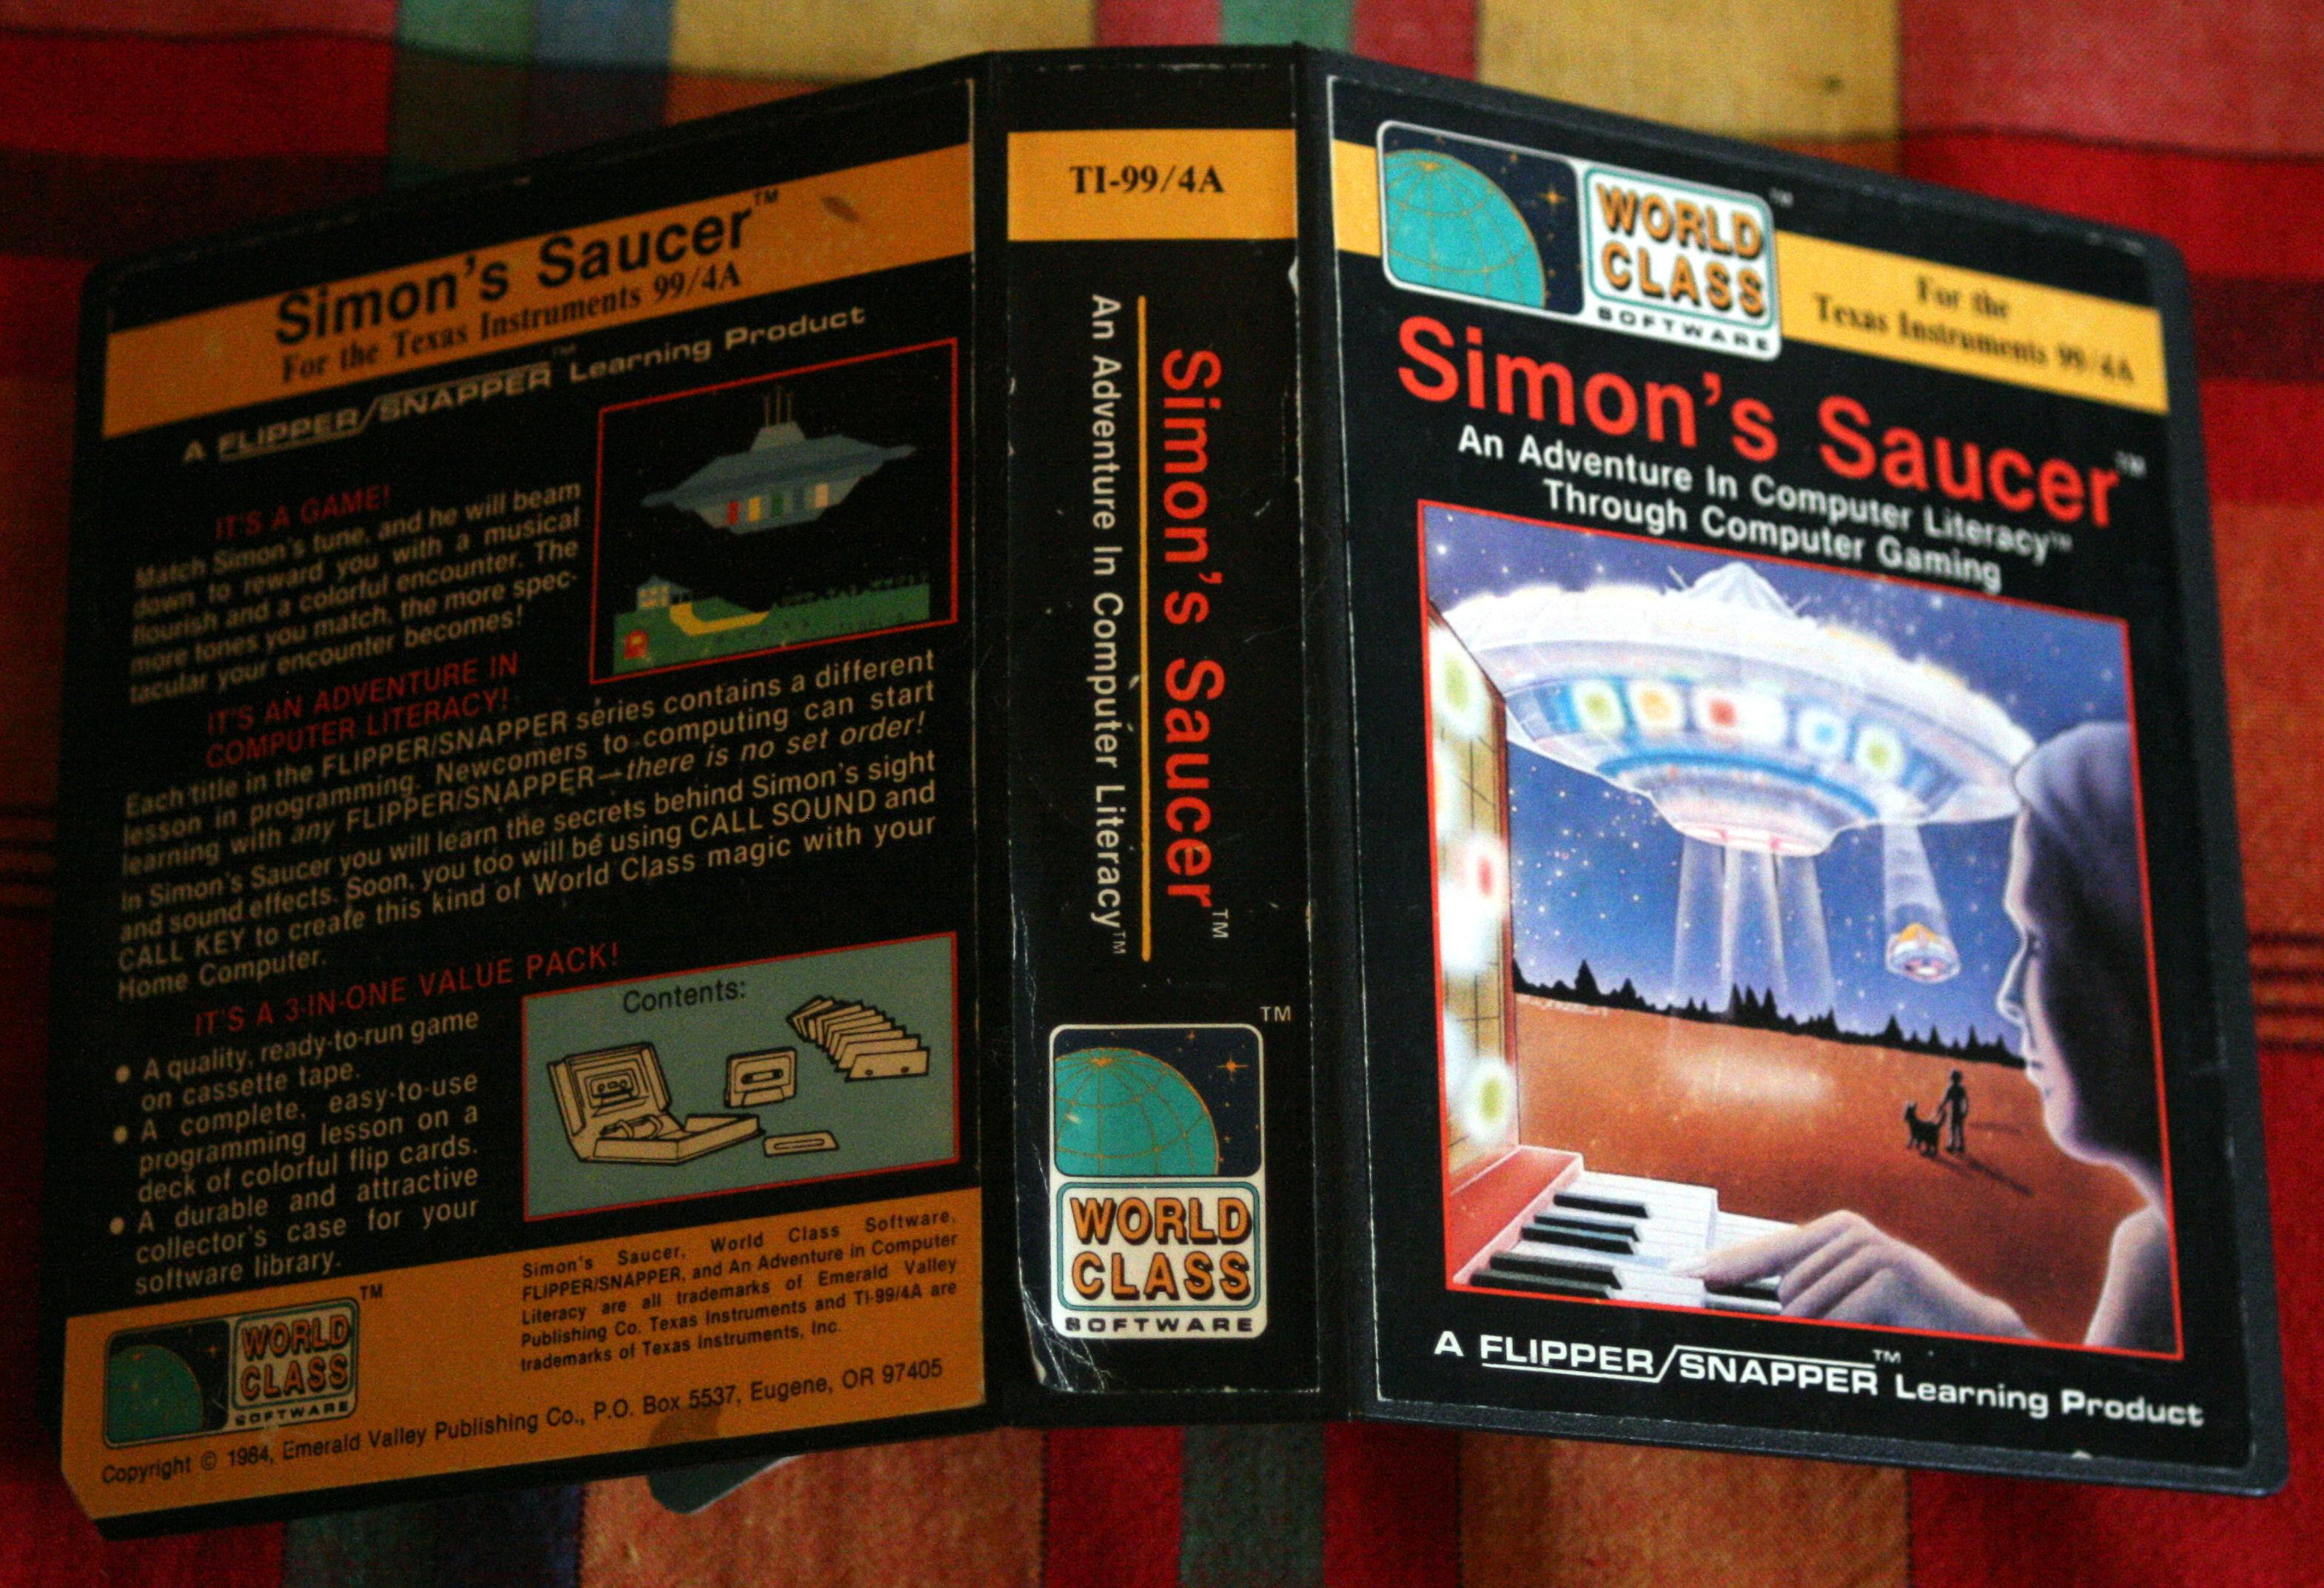 Simon's Saucer1